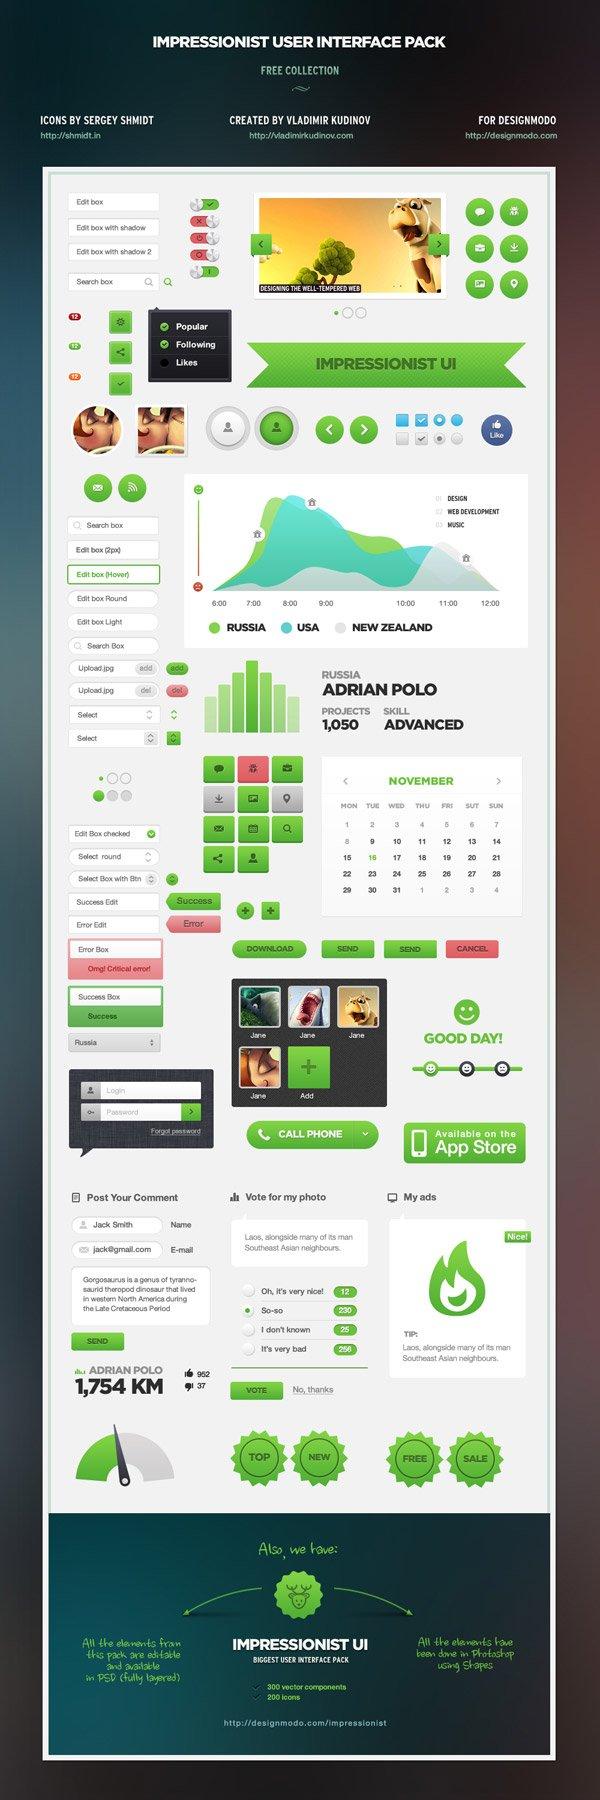 Impressionist UI Free User Interface Pack